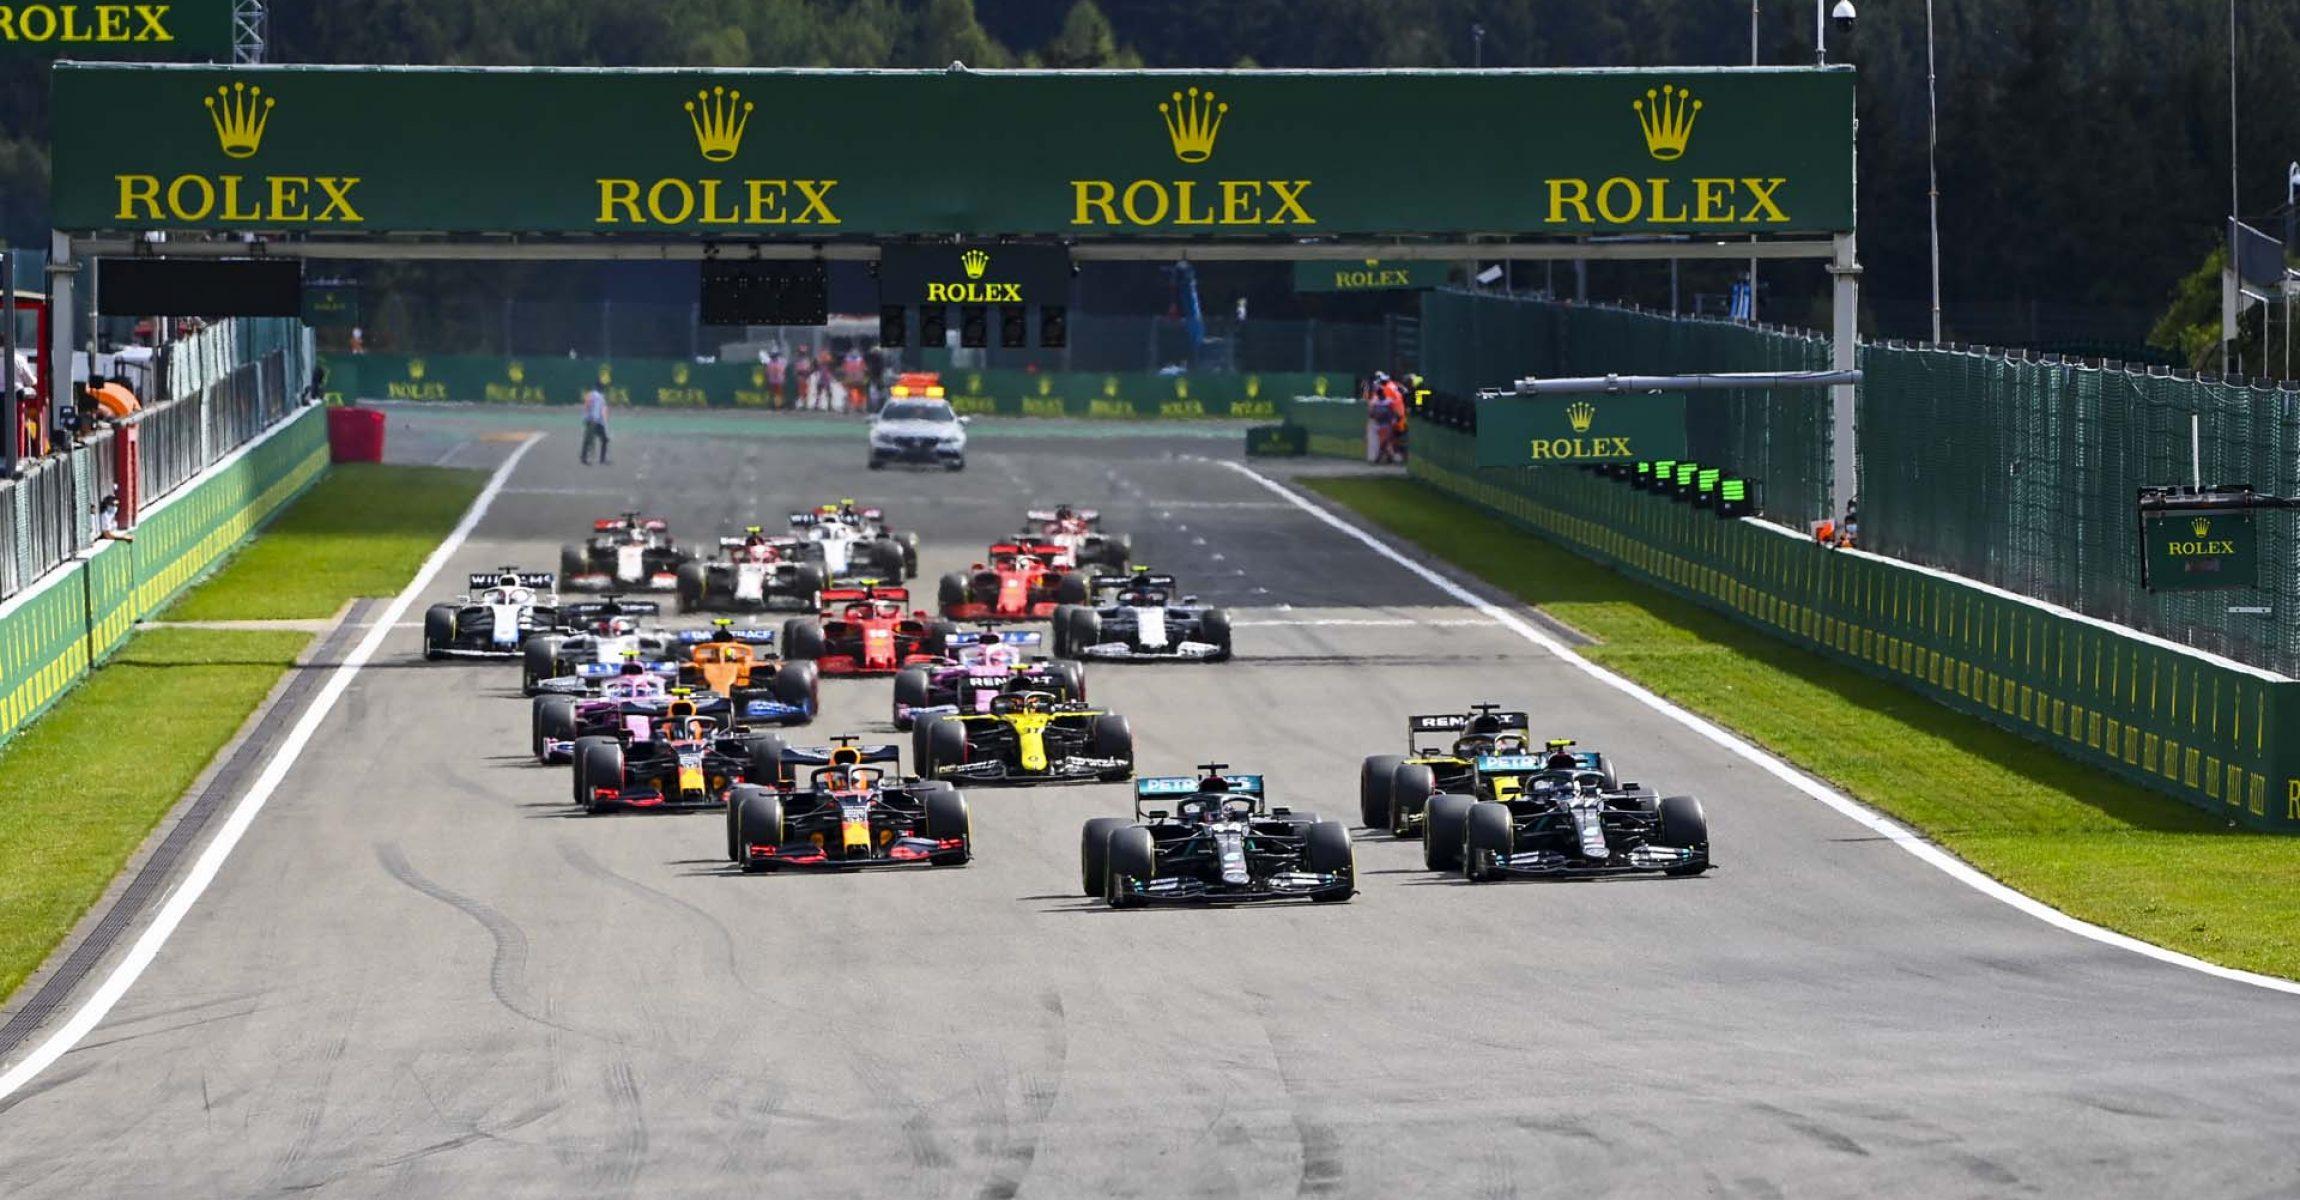 2020 Belgian Grand Prix, Sunday - LAT Images start